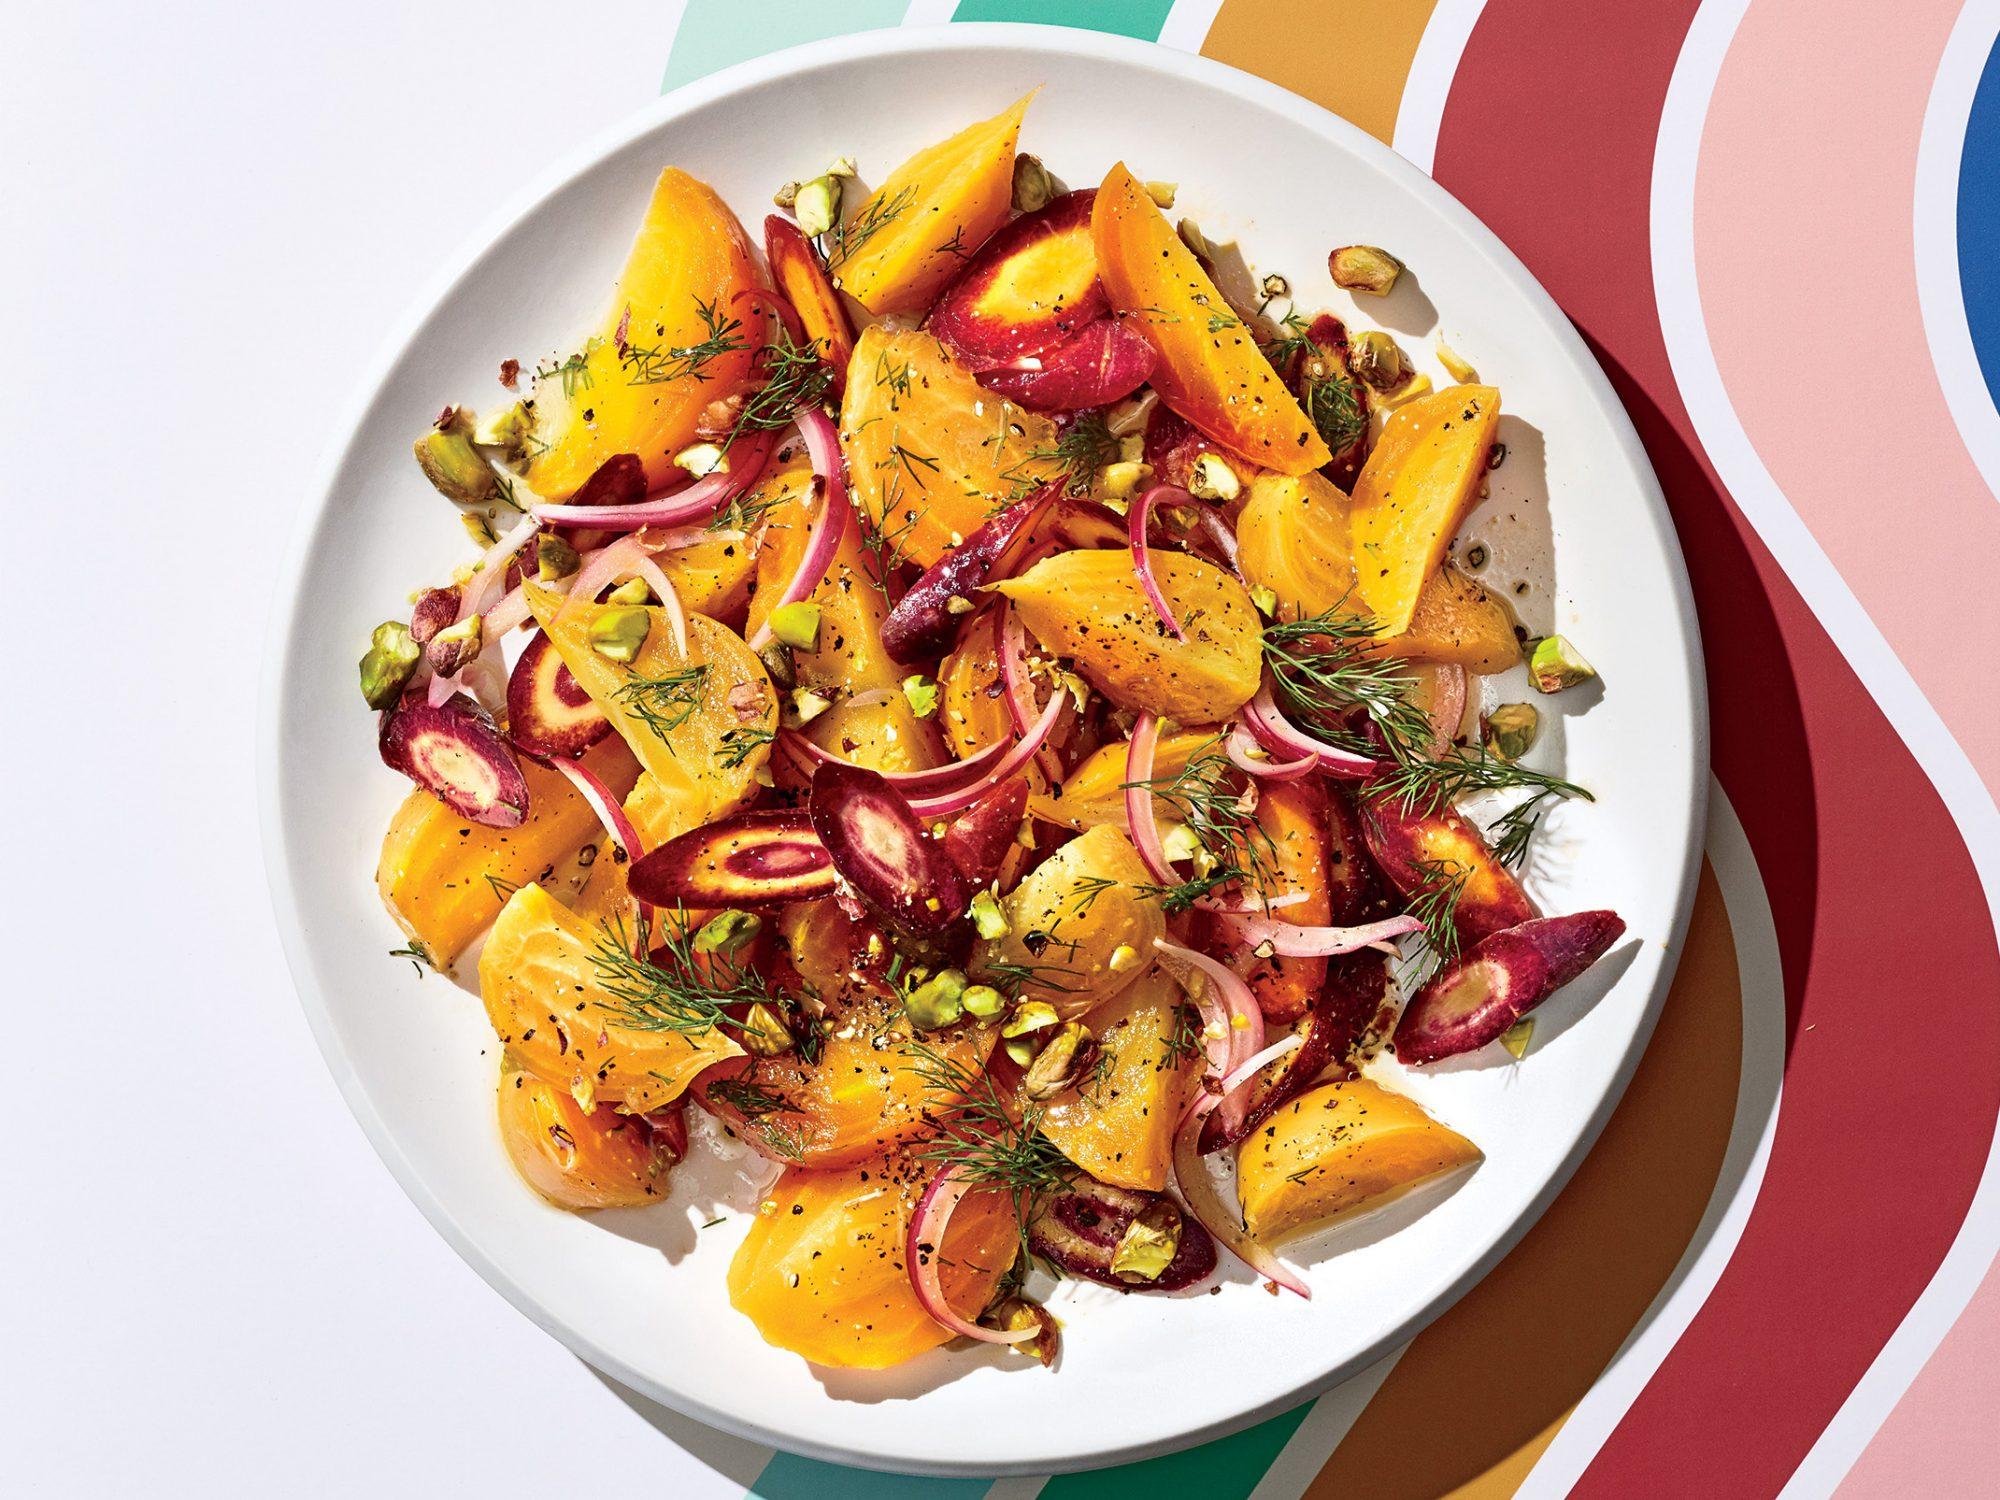 Beet, Carrot, and Pistachio Salad